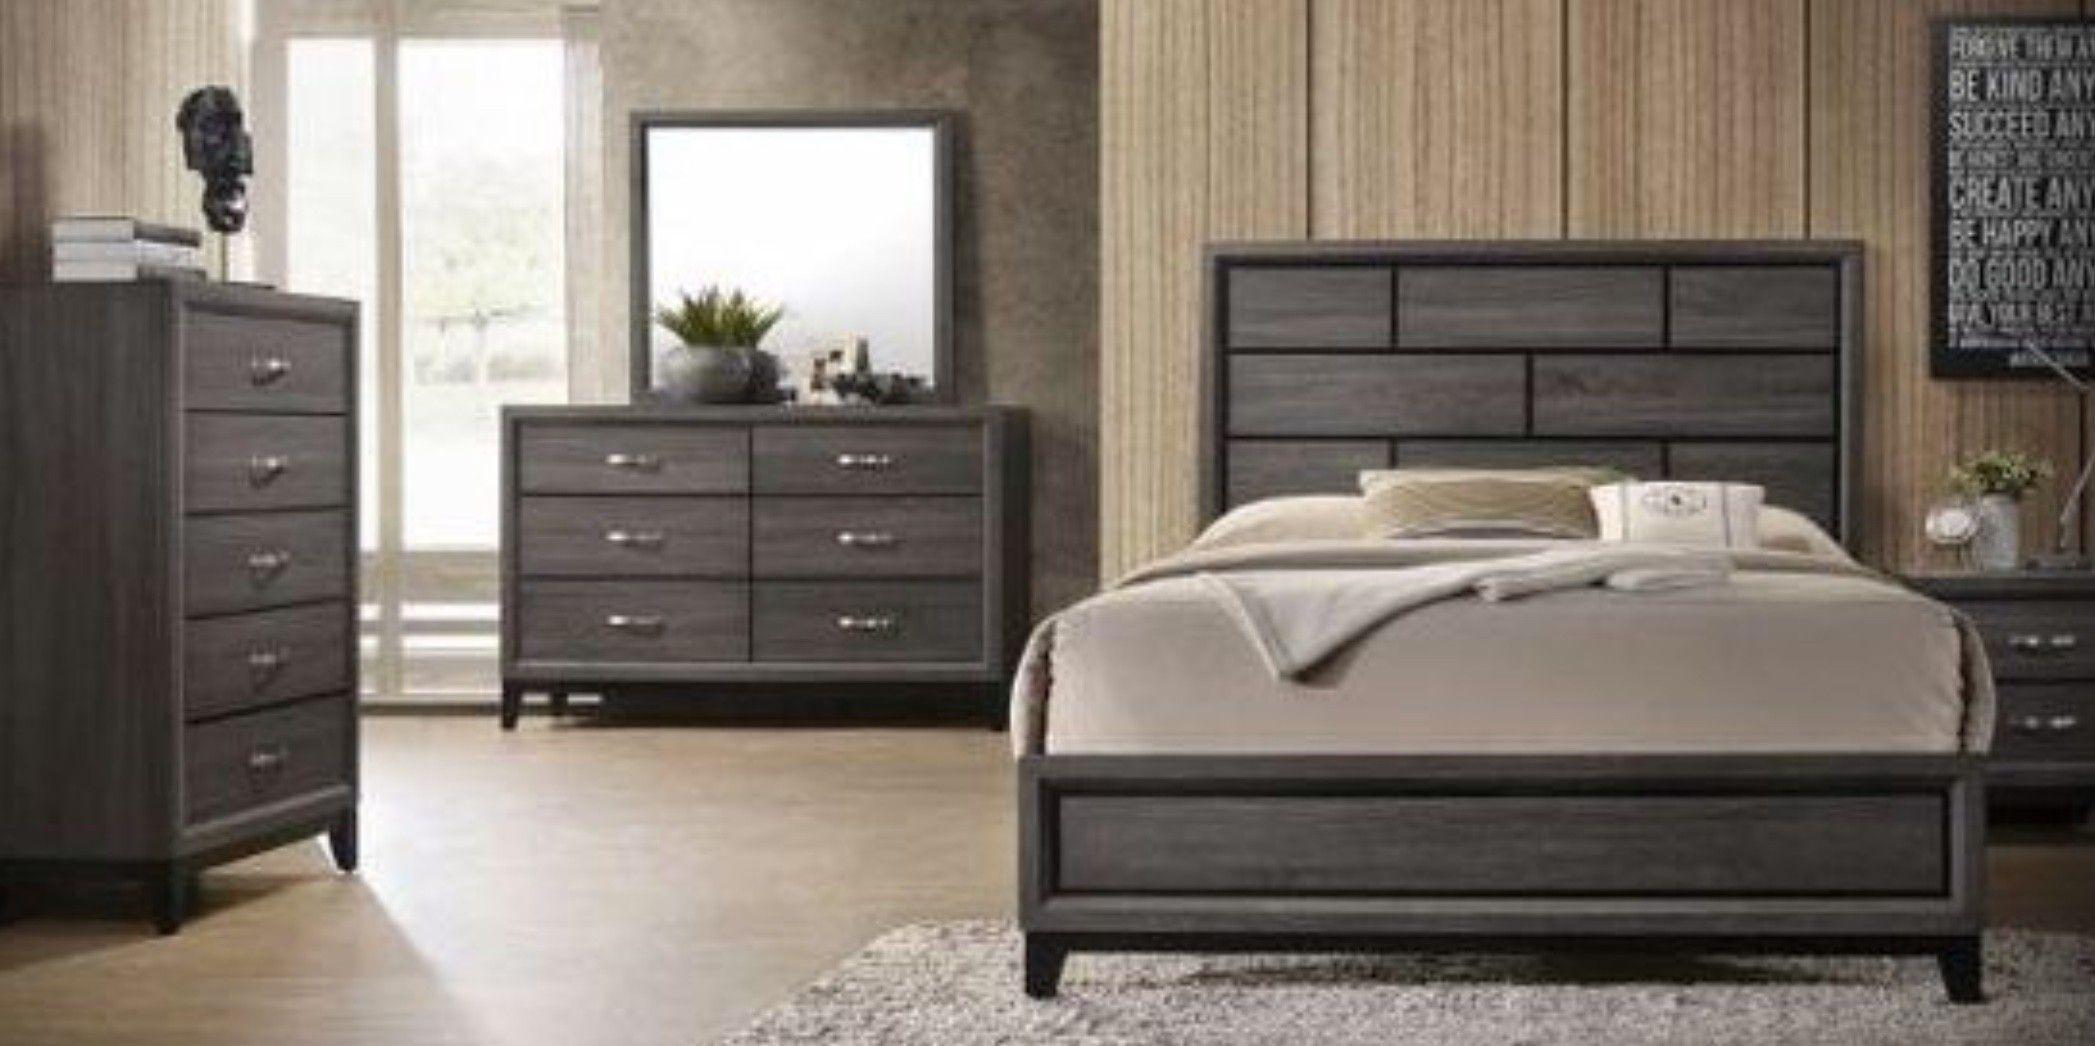 39 $down payment only 🤗4-PIECE QUEEN size gray bedroom set ( bed,Dresser,mirror,Nightstand)